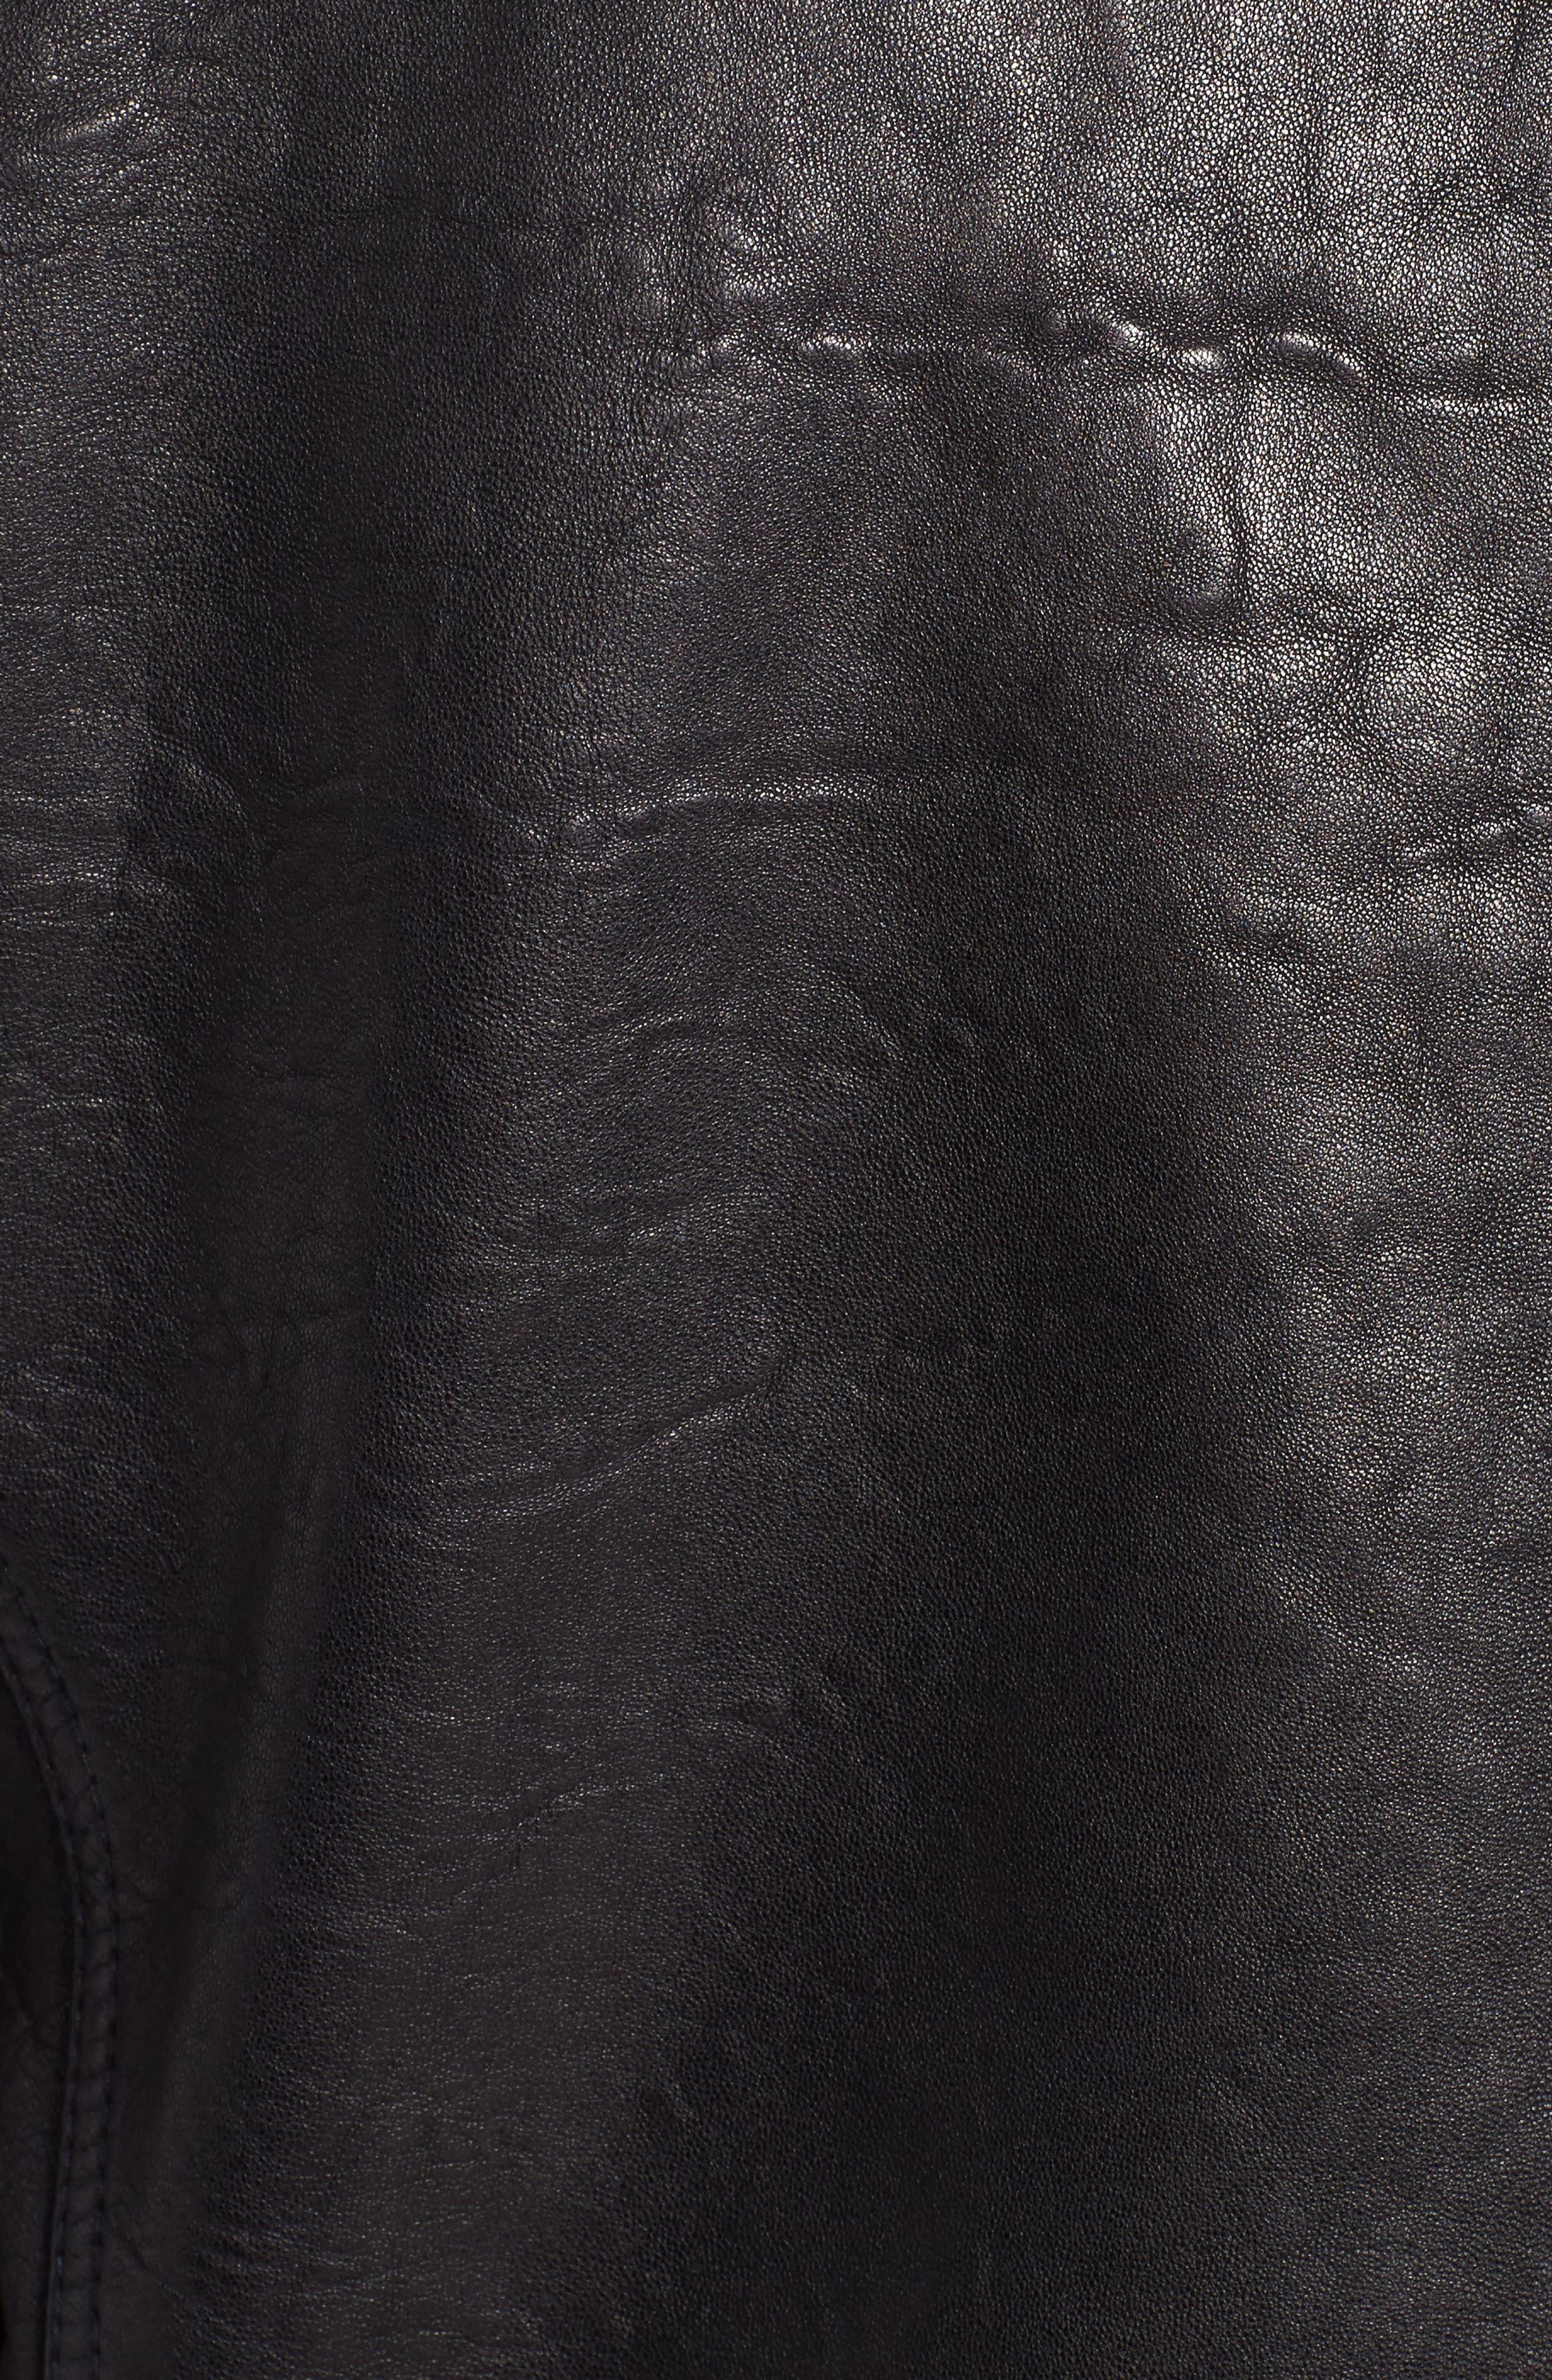 Morrison Spread Collar Leather Jacket,                             Alternate thumbnail 6, color,                             Ink